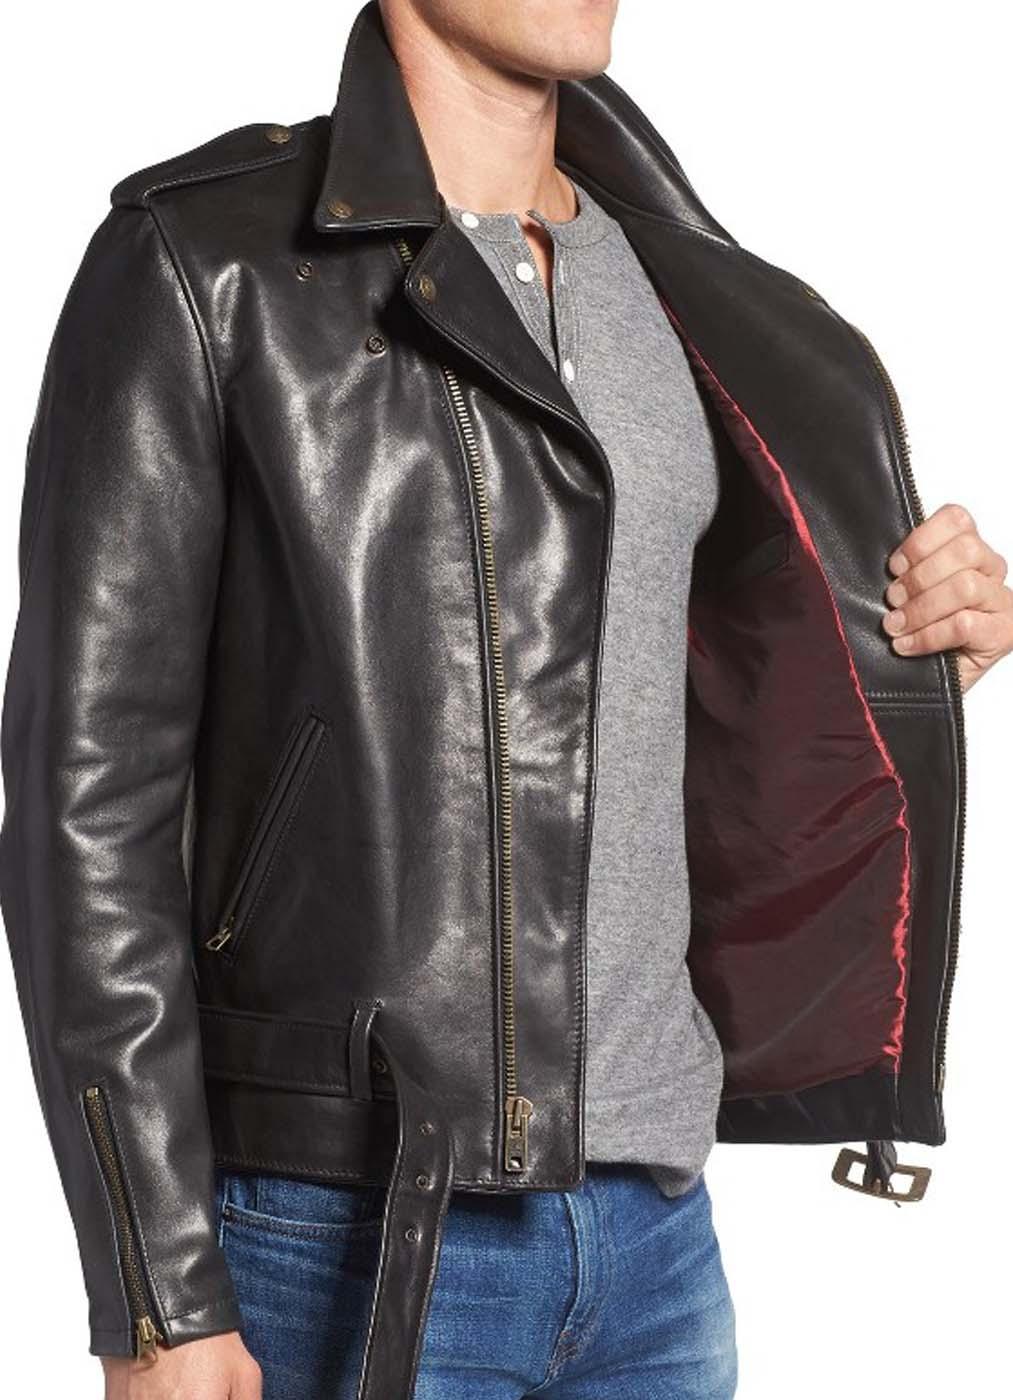 Leather Moto Jacket For Men 1.